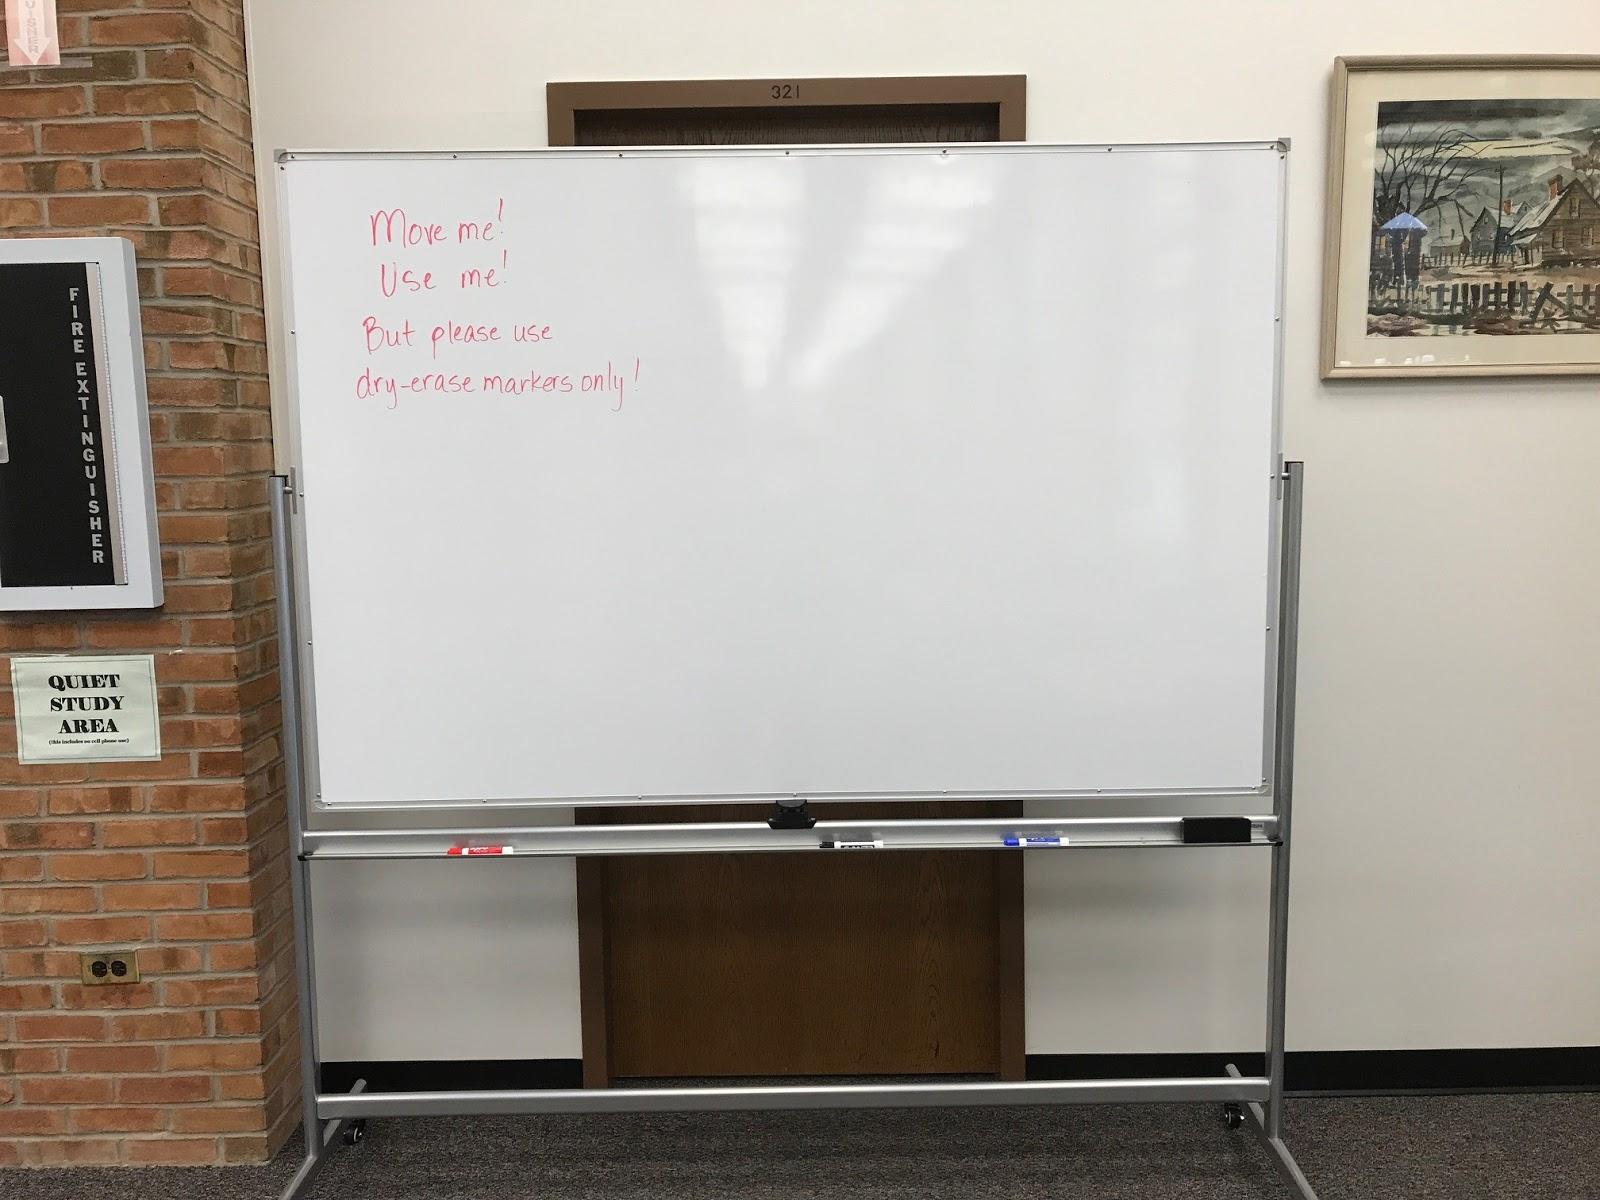 Library Fsu Study Rooms